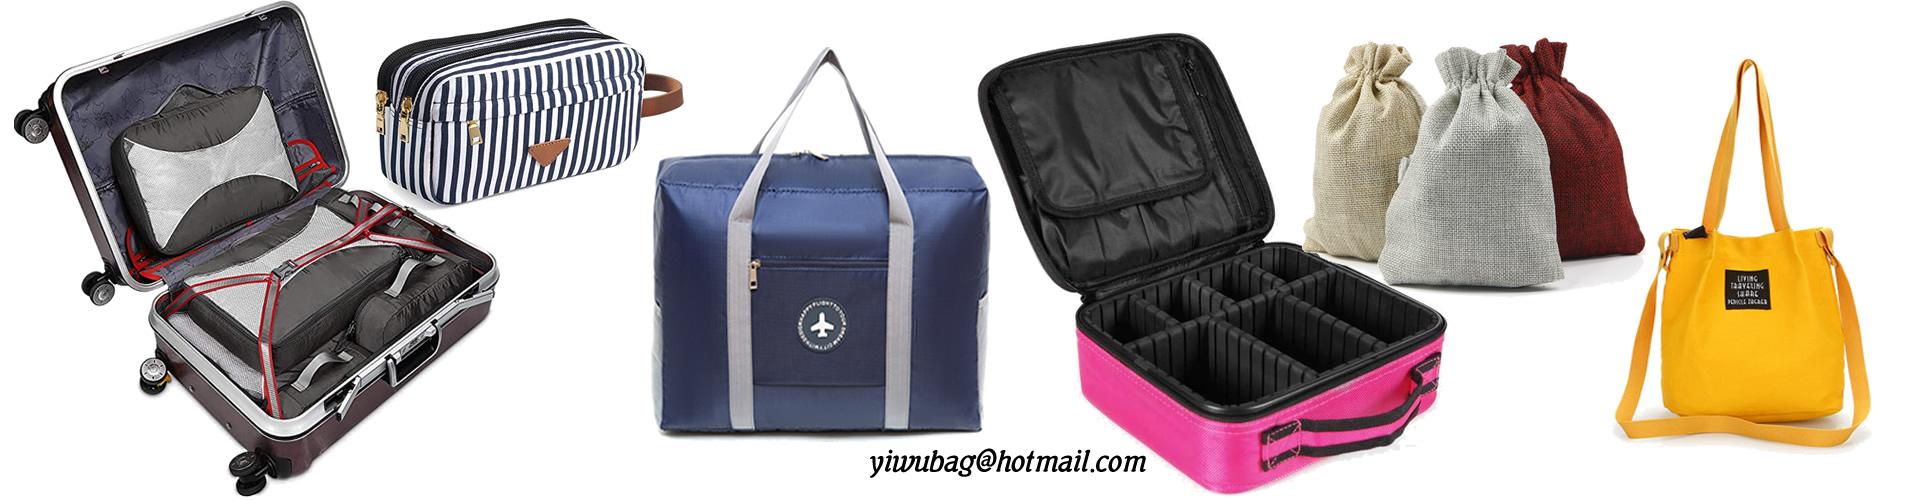 travel bag,duffle bag,sports bag,storage bag,duffle bag,tote bag,trolley bag,packing cubes,storage boxes